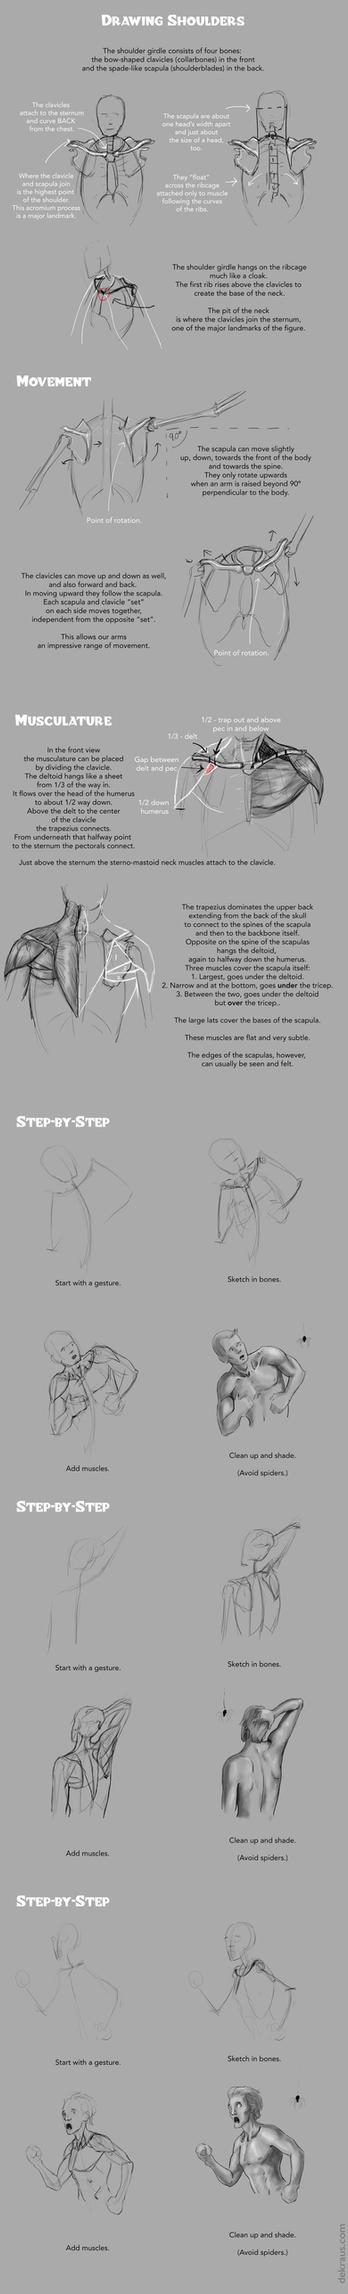 Drawing Shoulders Tutorial by banjodi